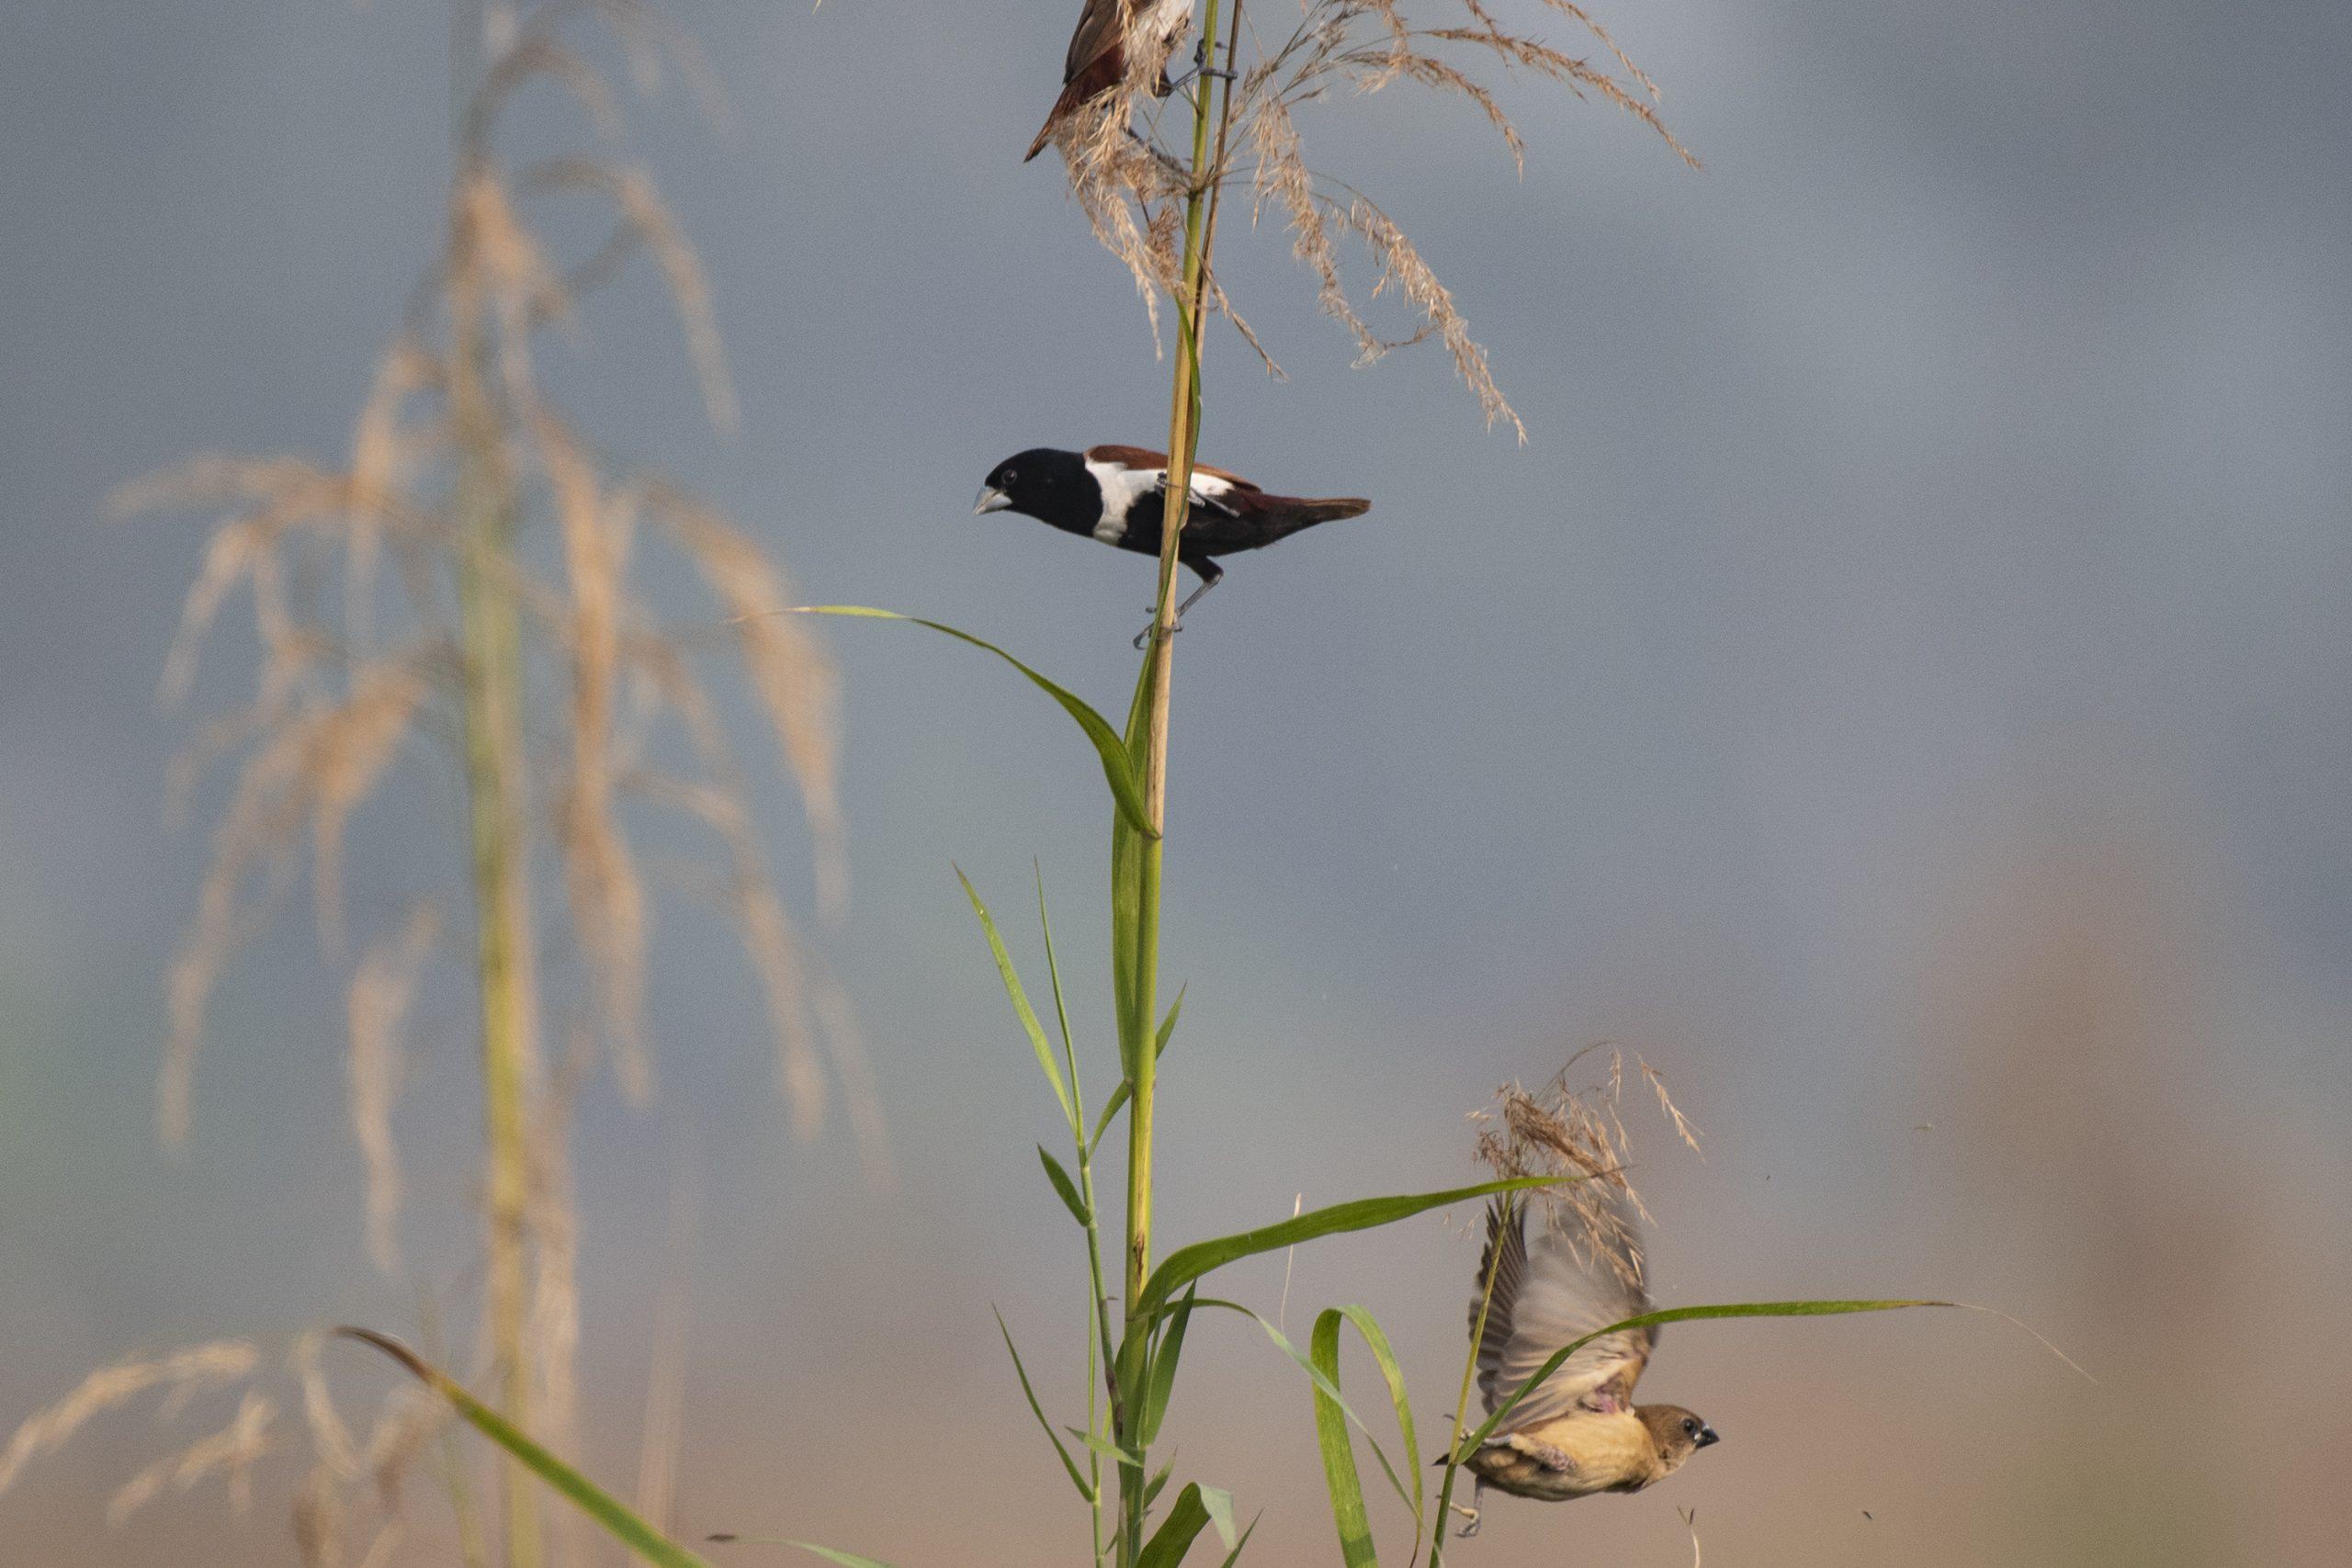 Black-headed Munia Bird in the Farm